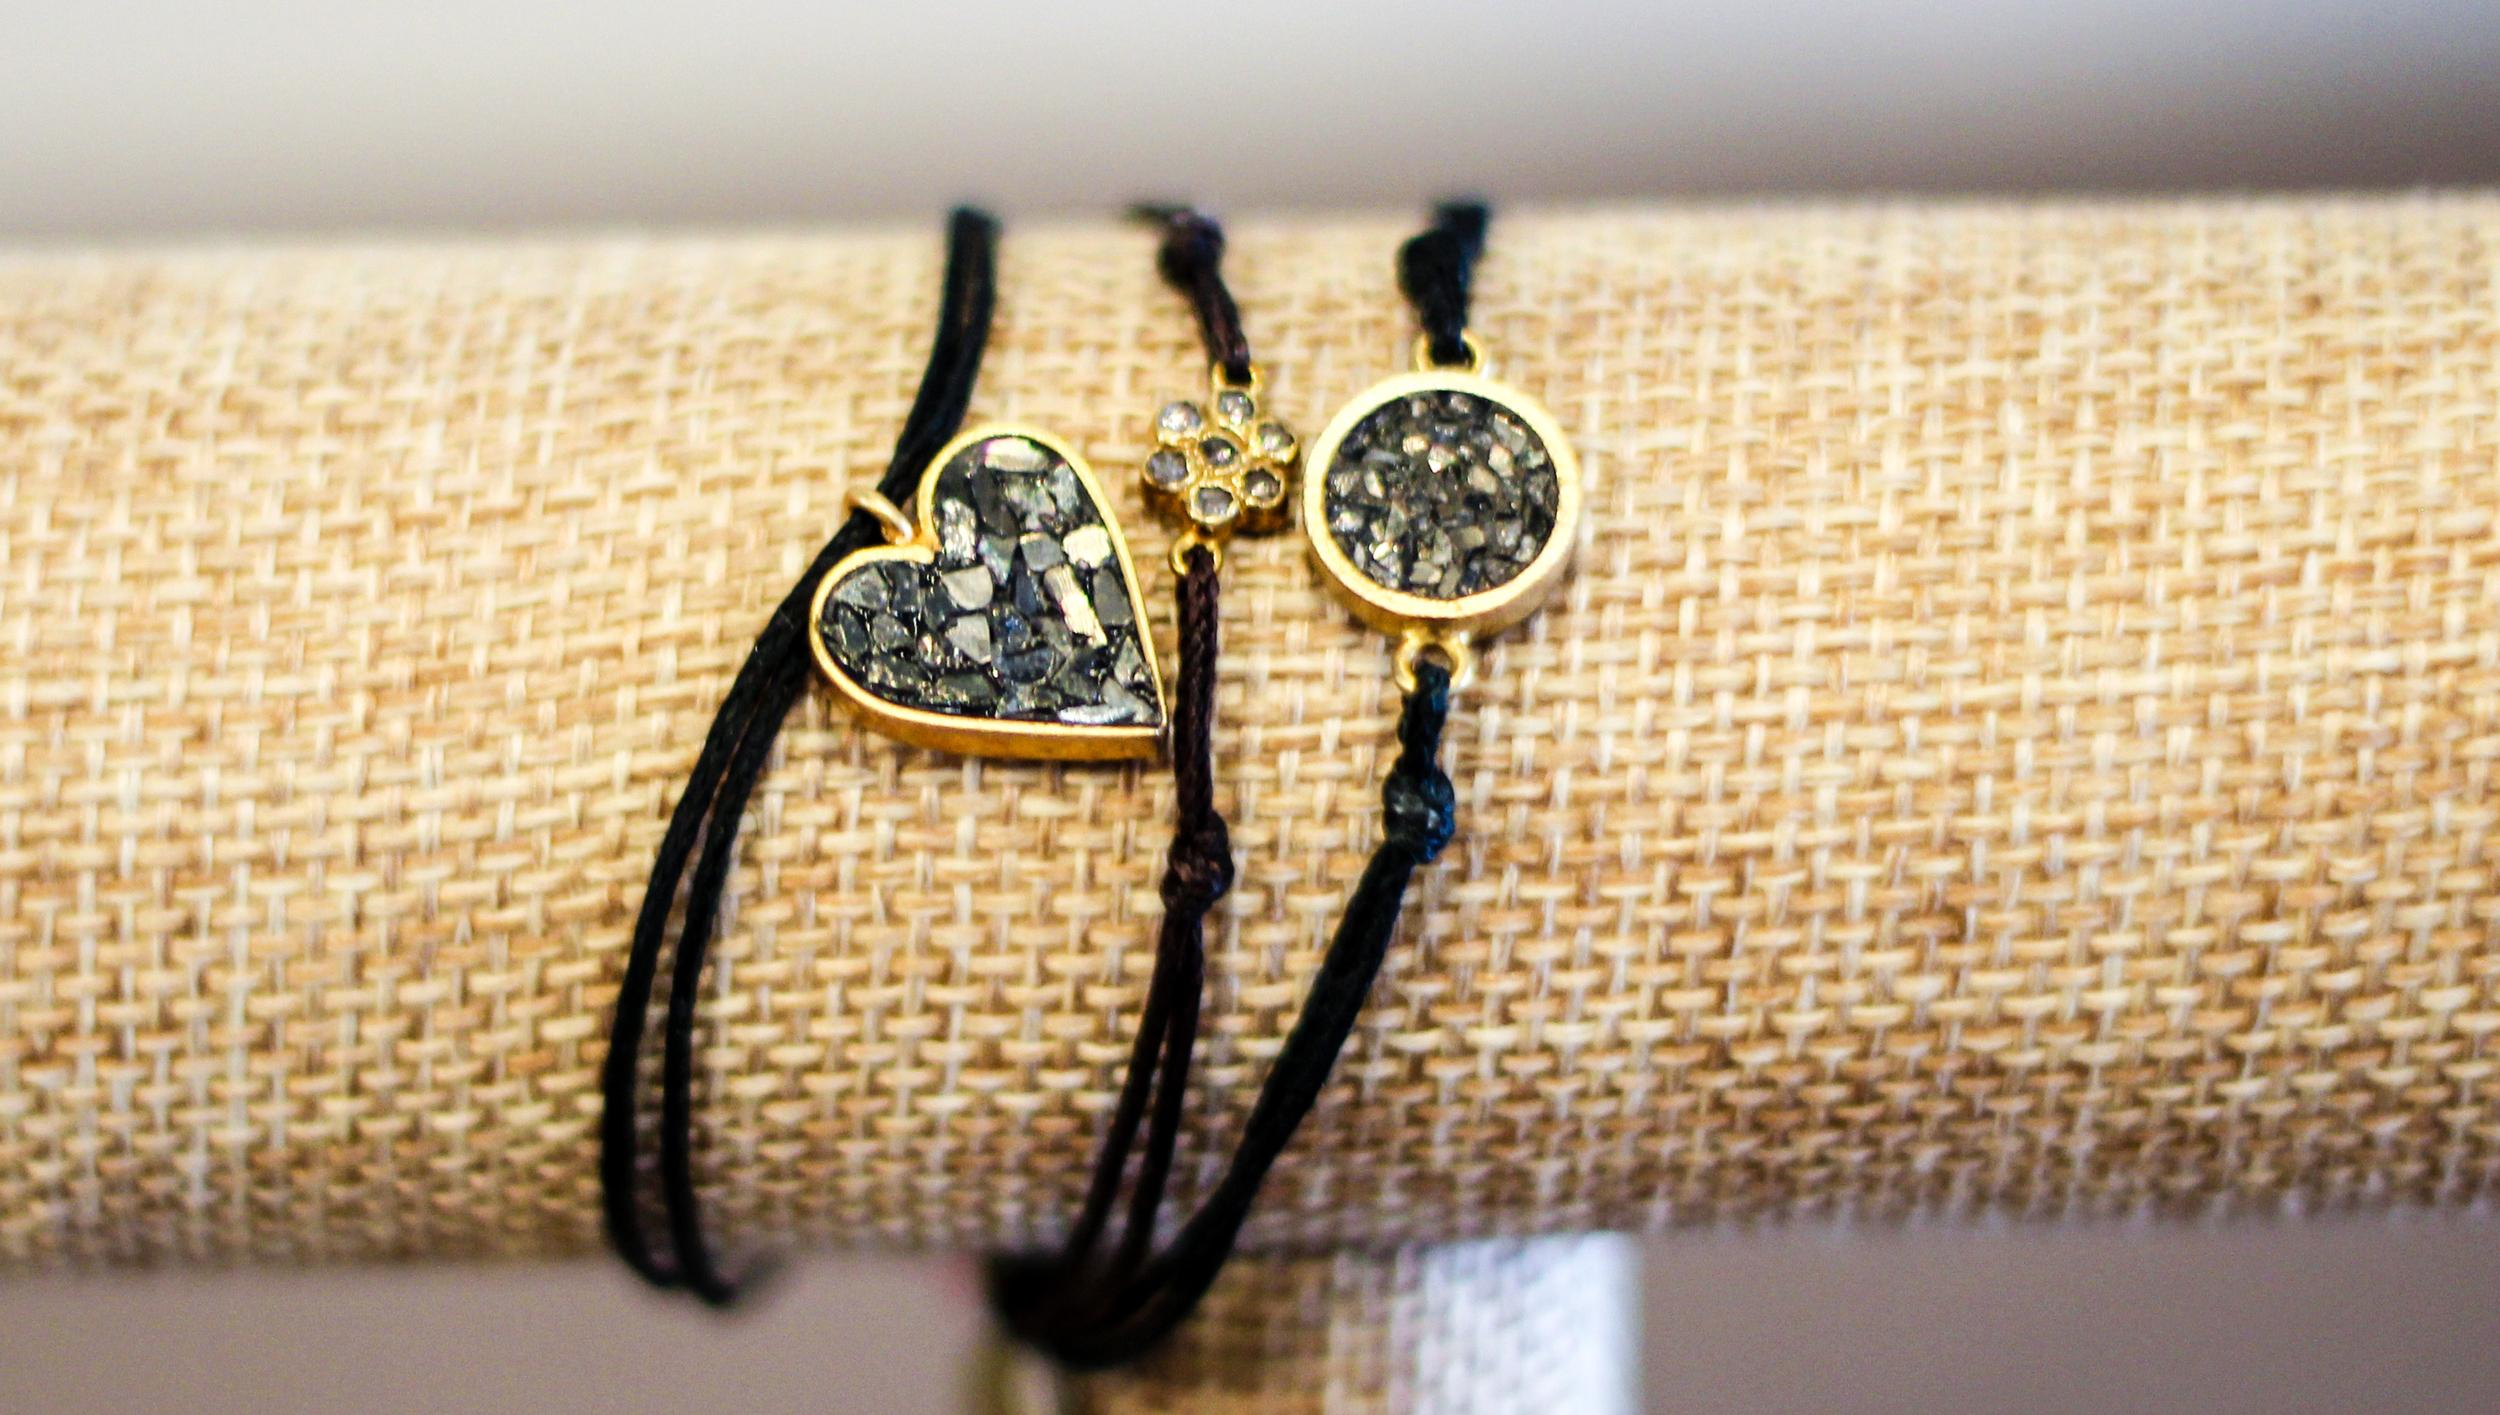 Black diamond bracelets handcrafted by Israeli artisans -$80